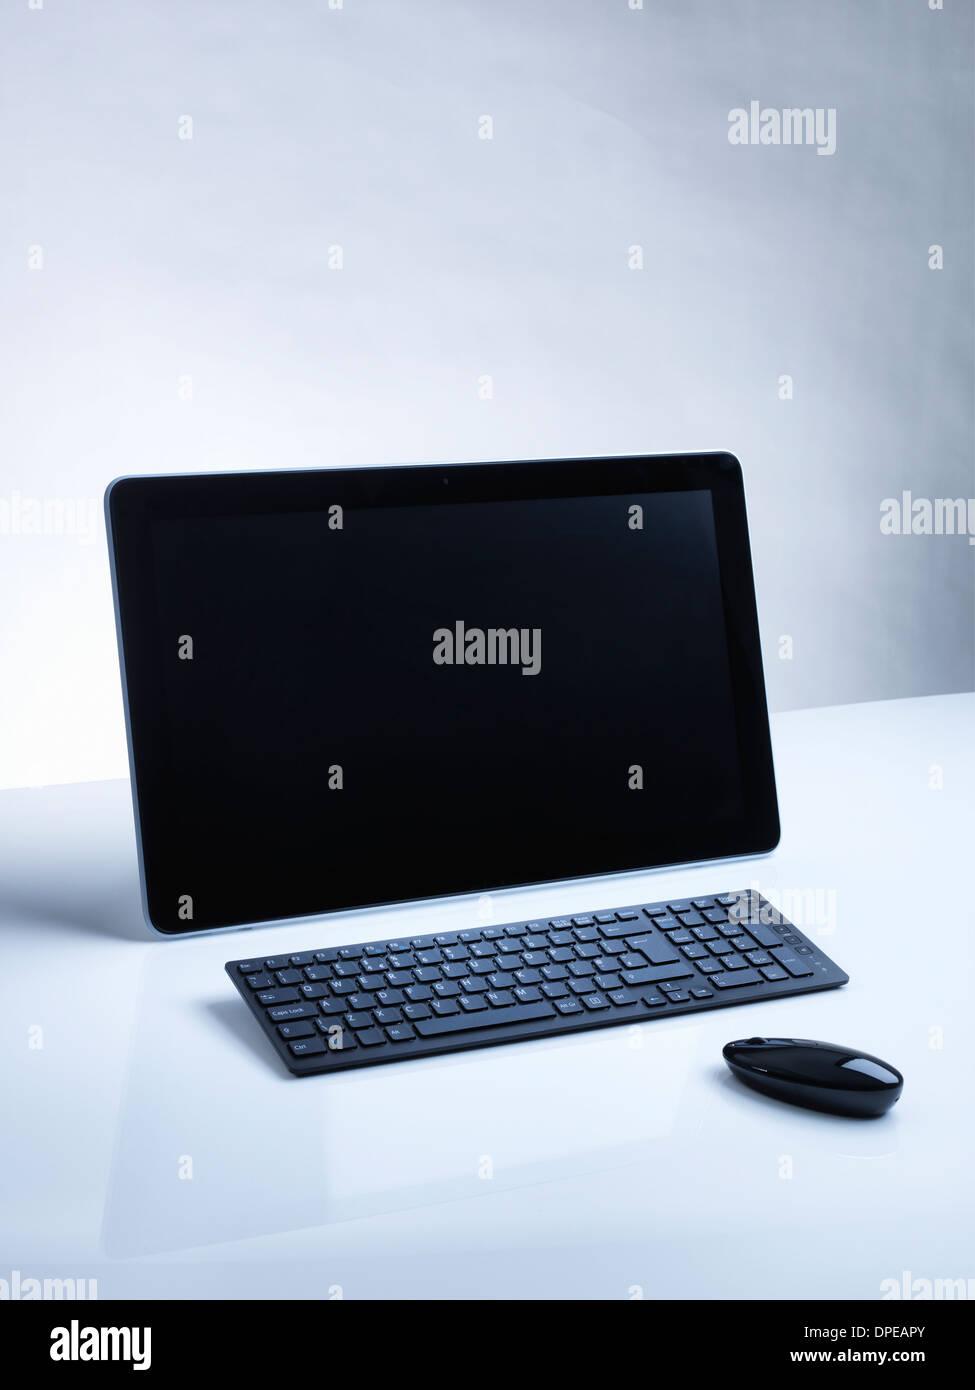 Computer on desk - Stock Image